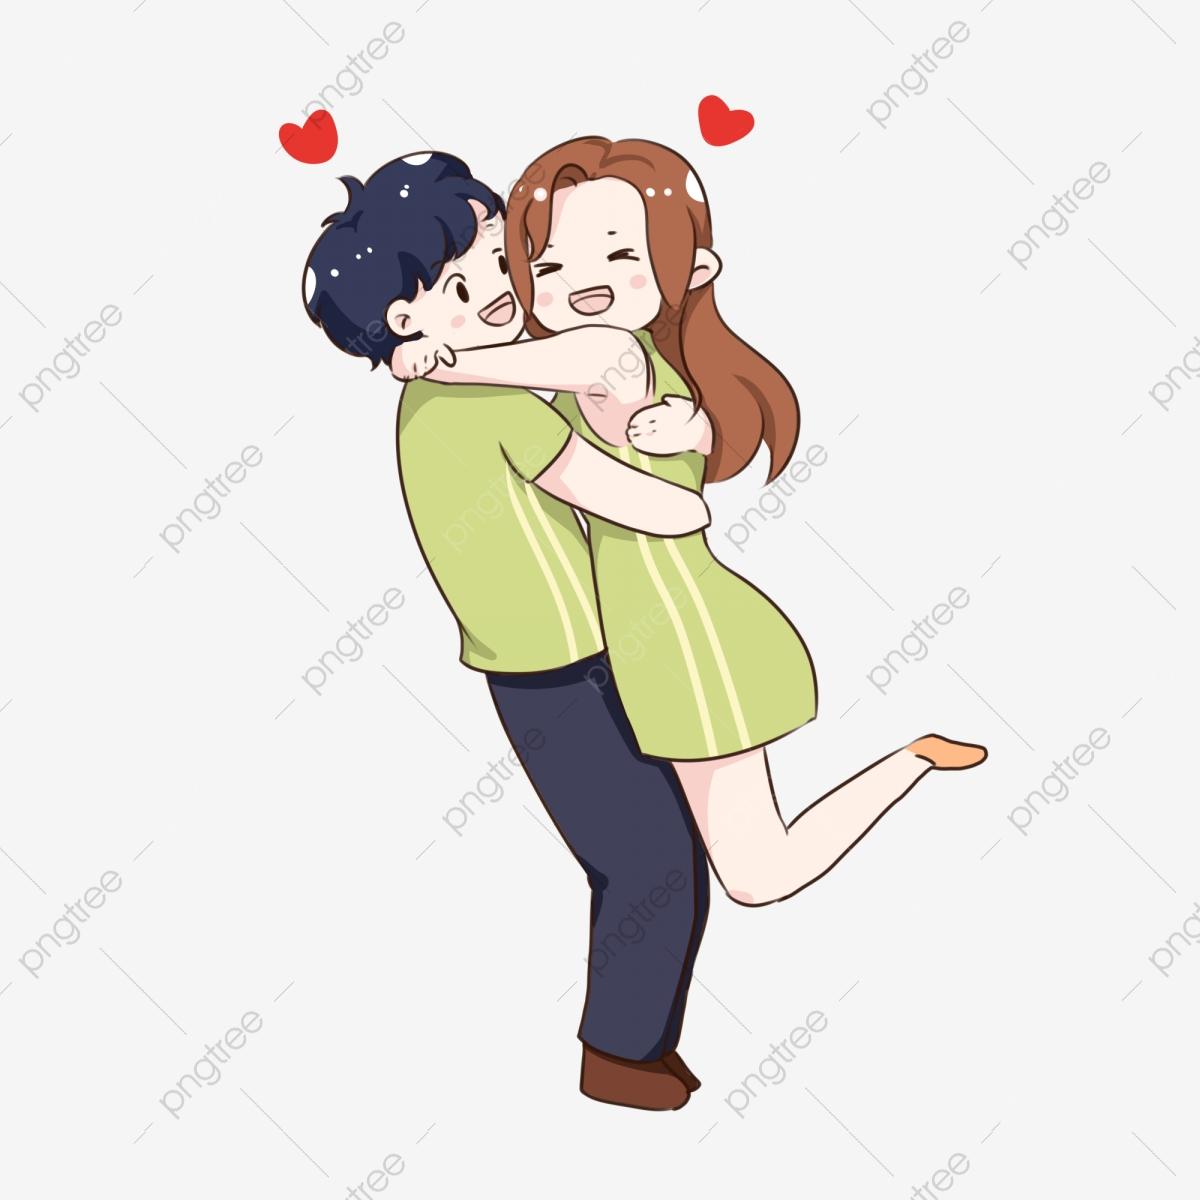 Hand drawn cartoon green. Hugging clipart hug day